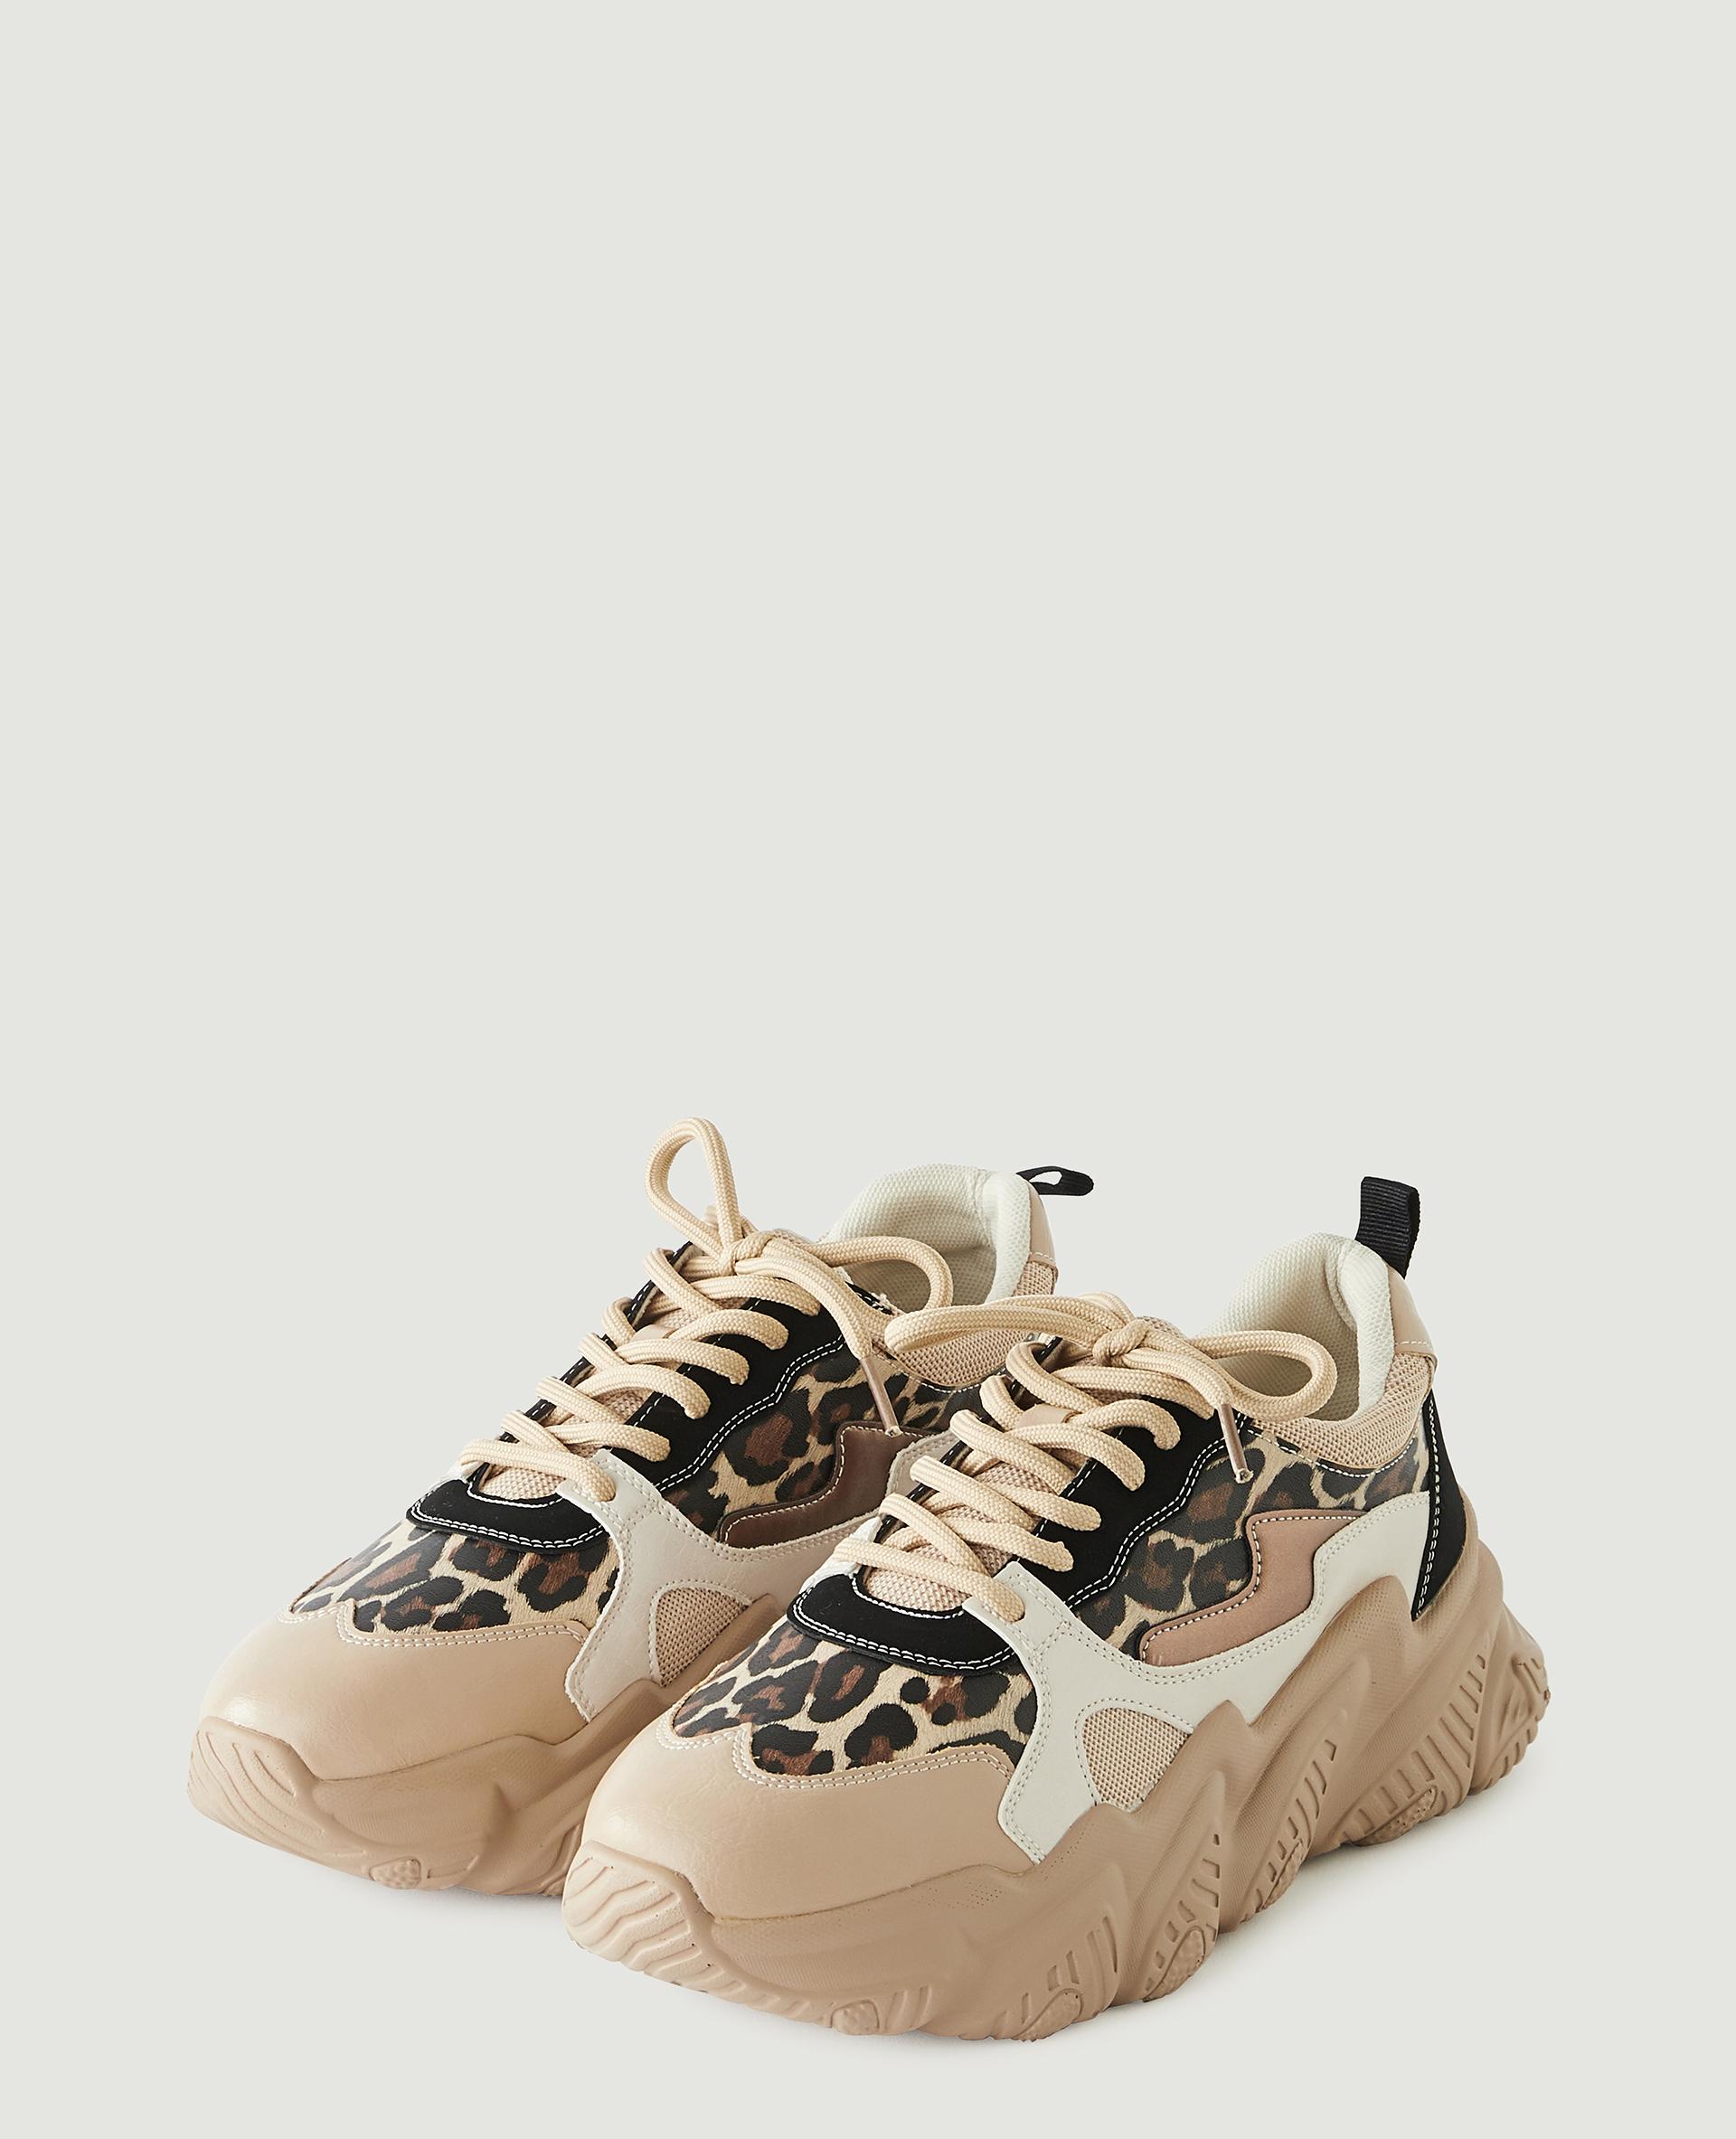 Scarpe da tennis con zeppa leopardate beige - Pimkie